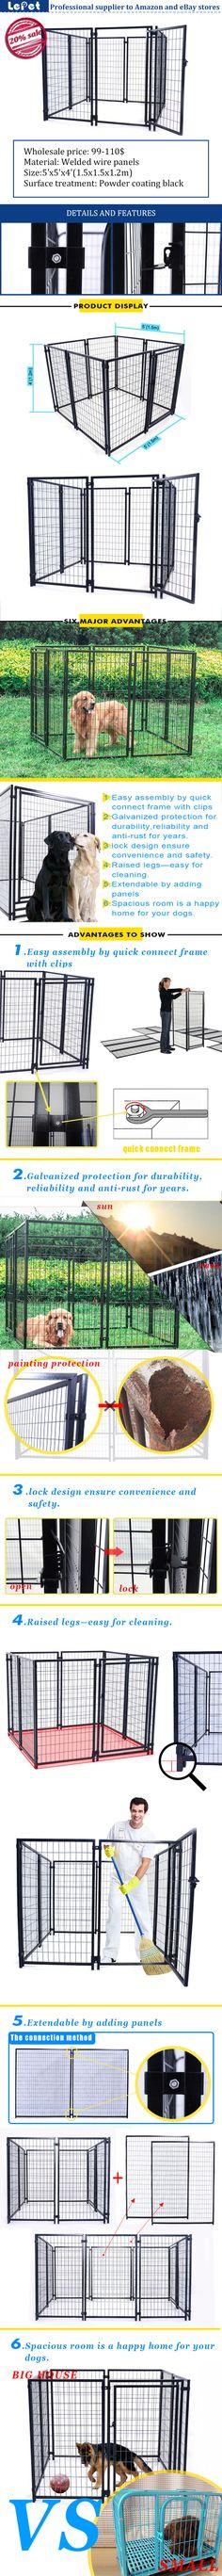 large welded wire dog kennel /chain link dog kennel/dog cage/dog run manufacturer wholesale supplier